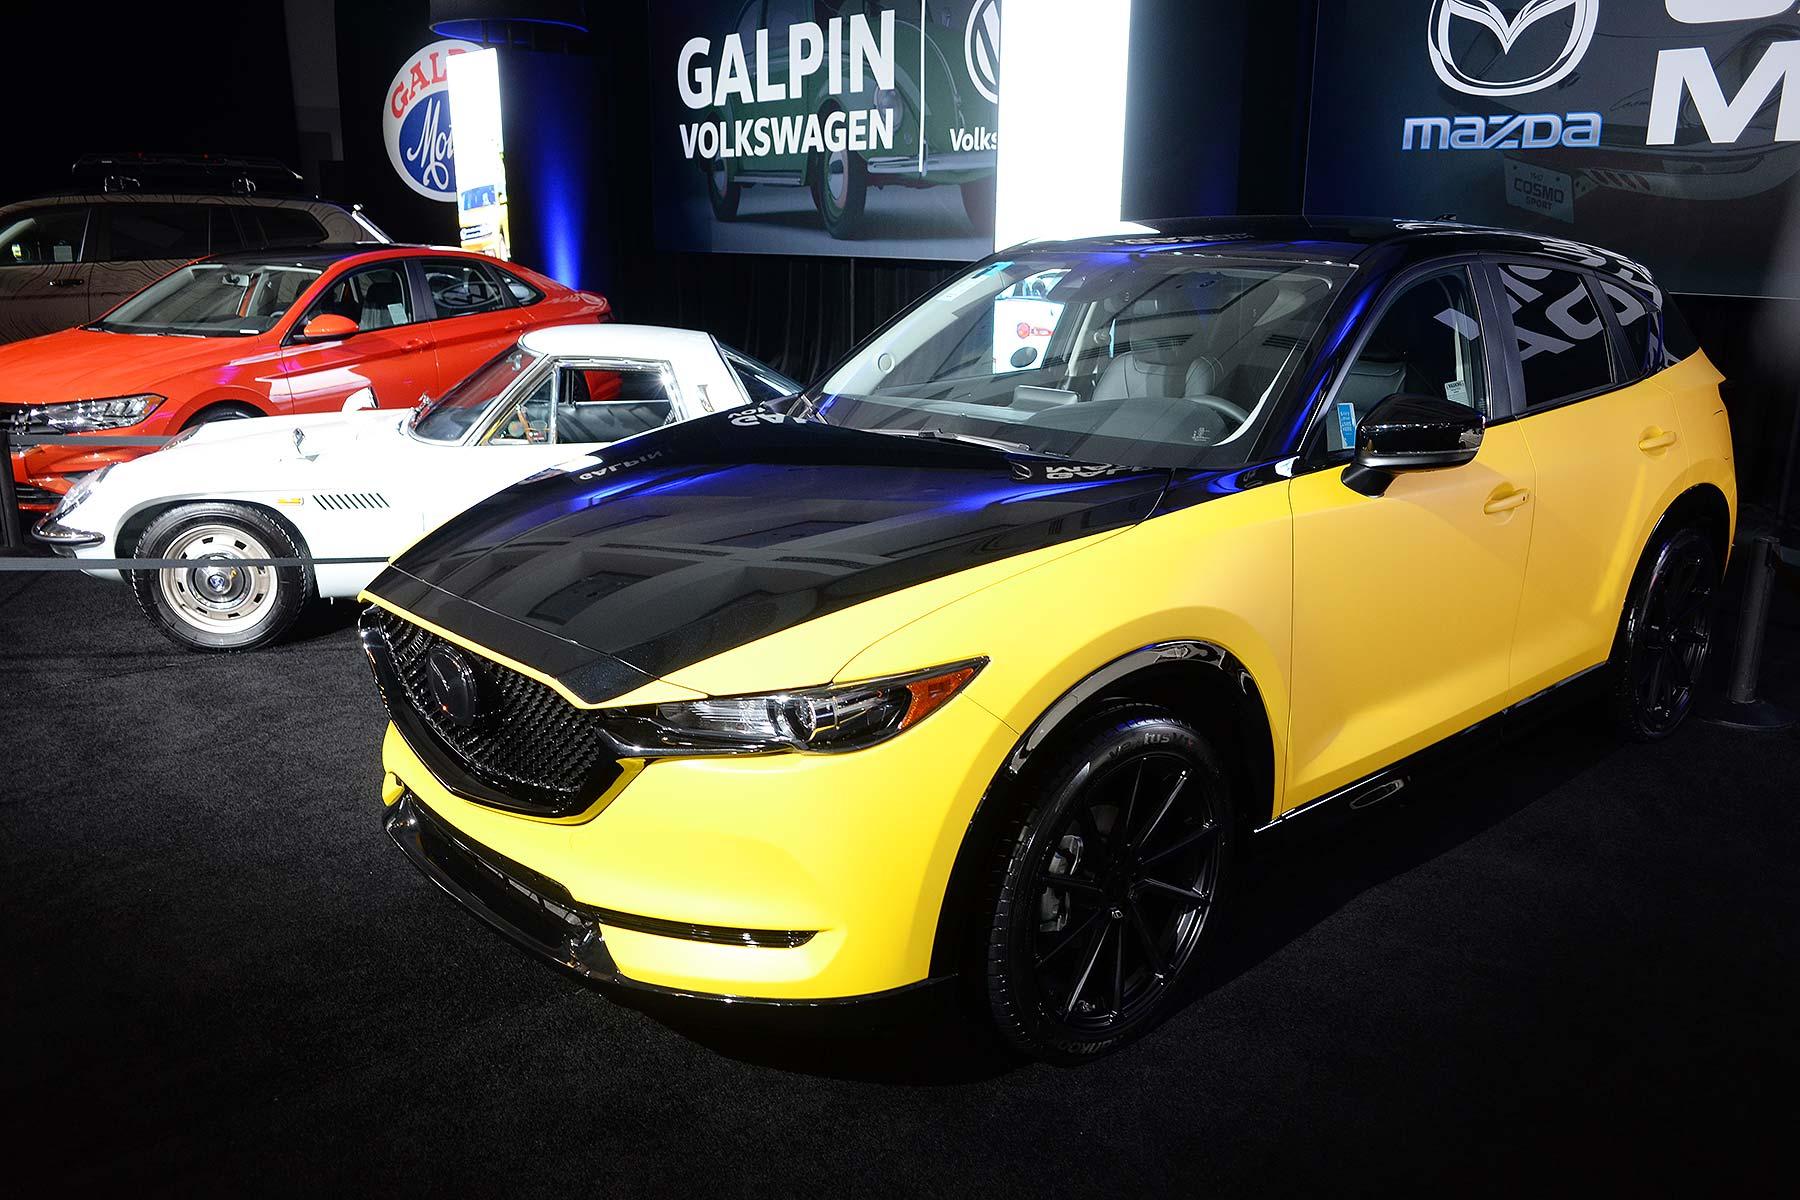 Galpin Mazda CX-5